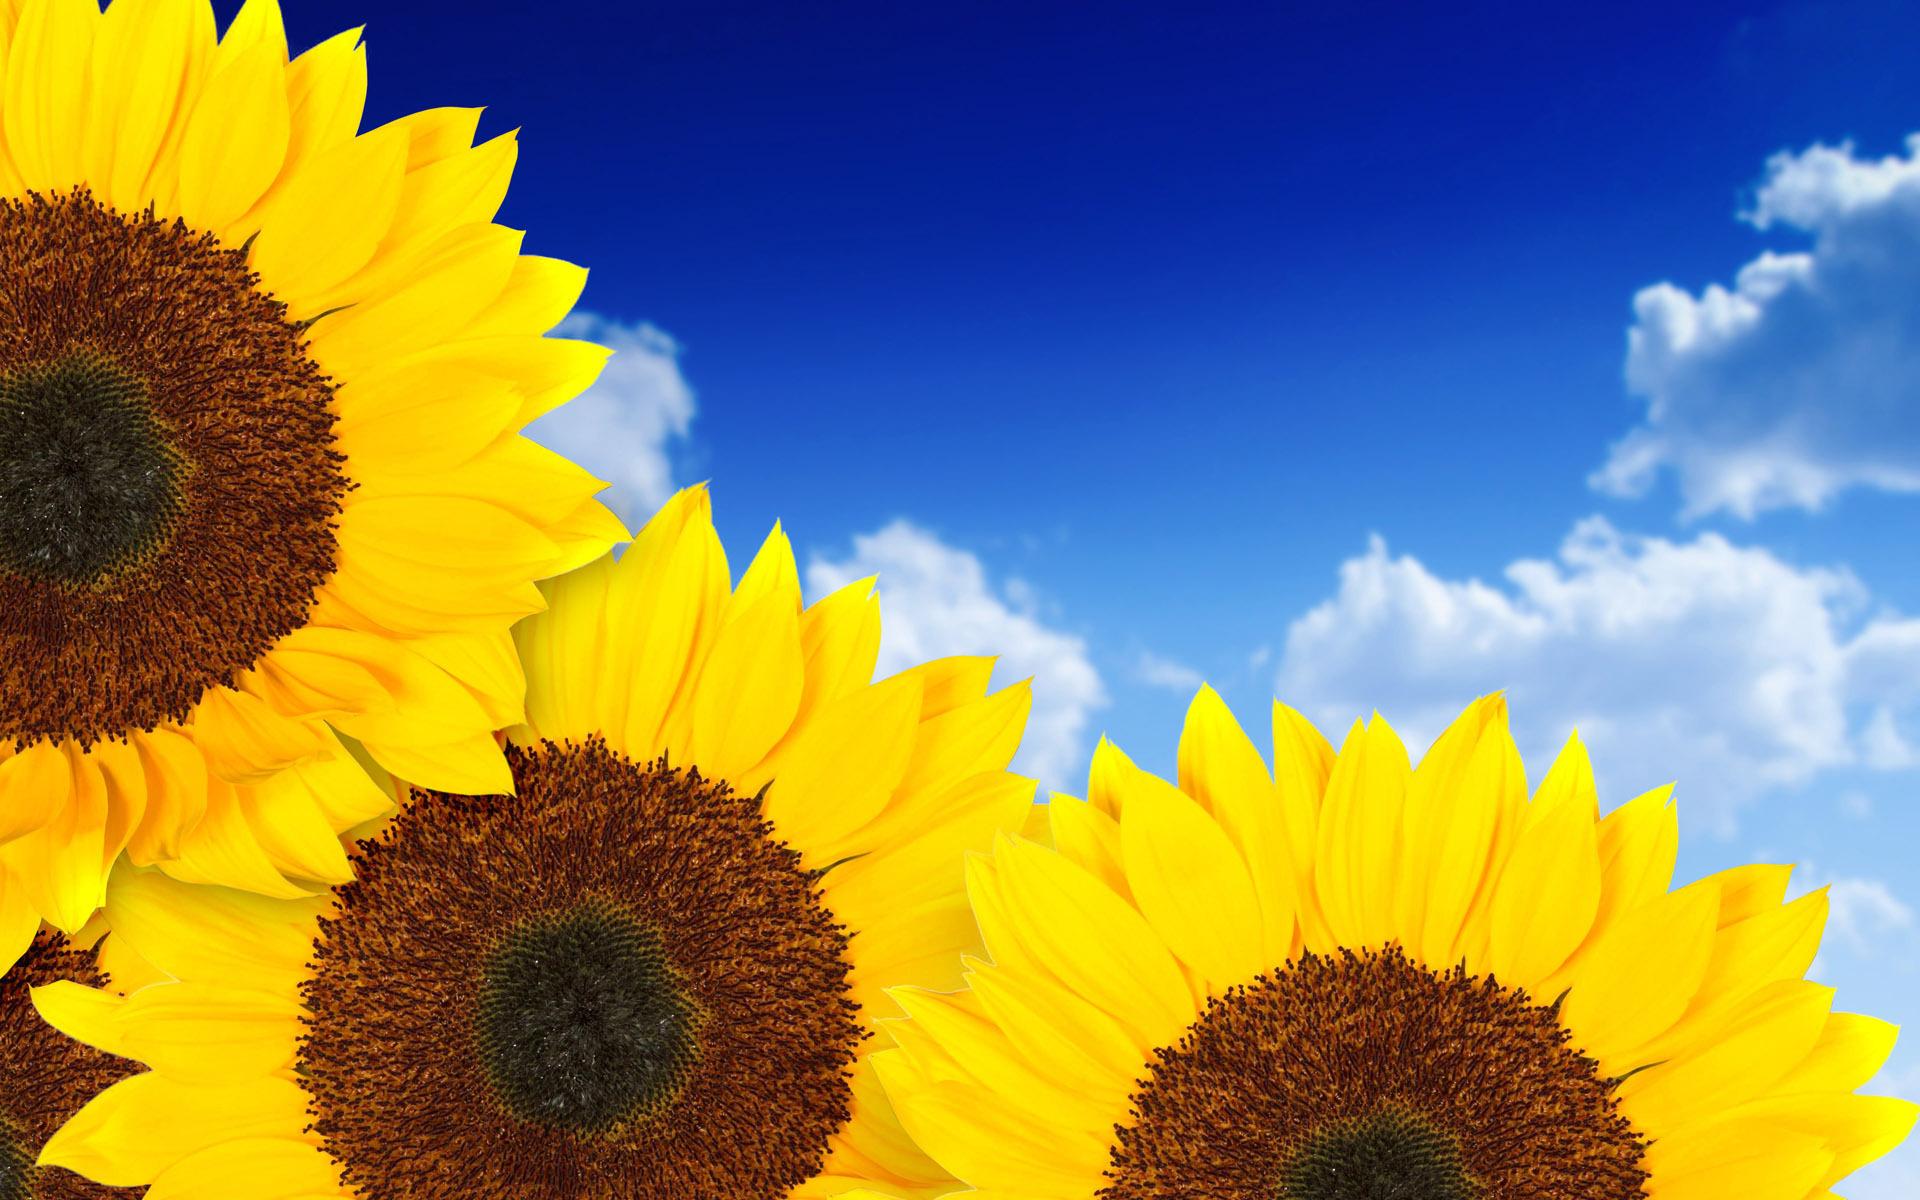 sun flowers photo